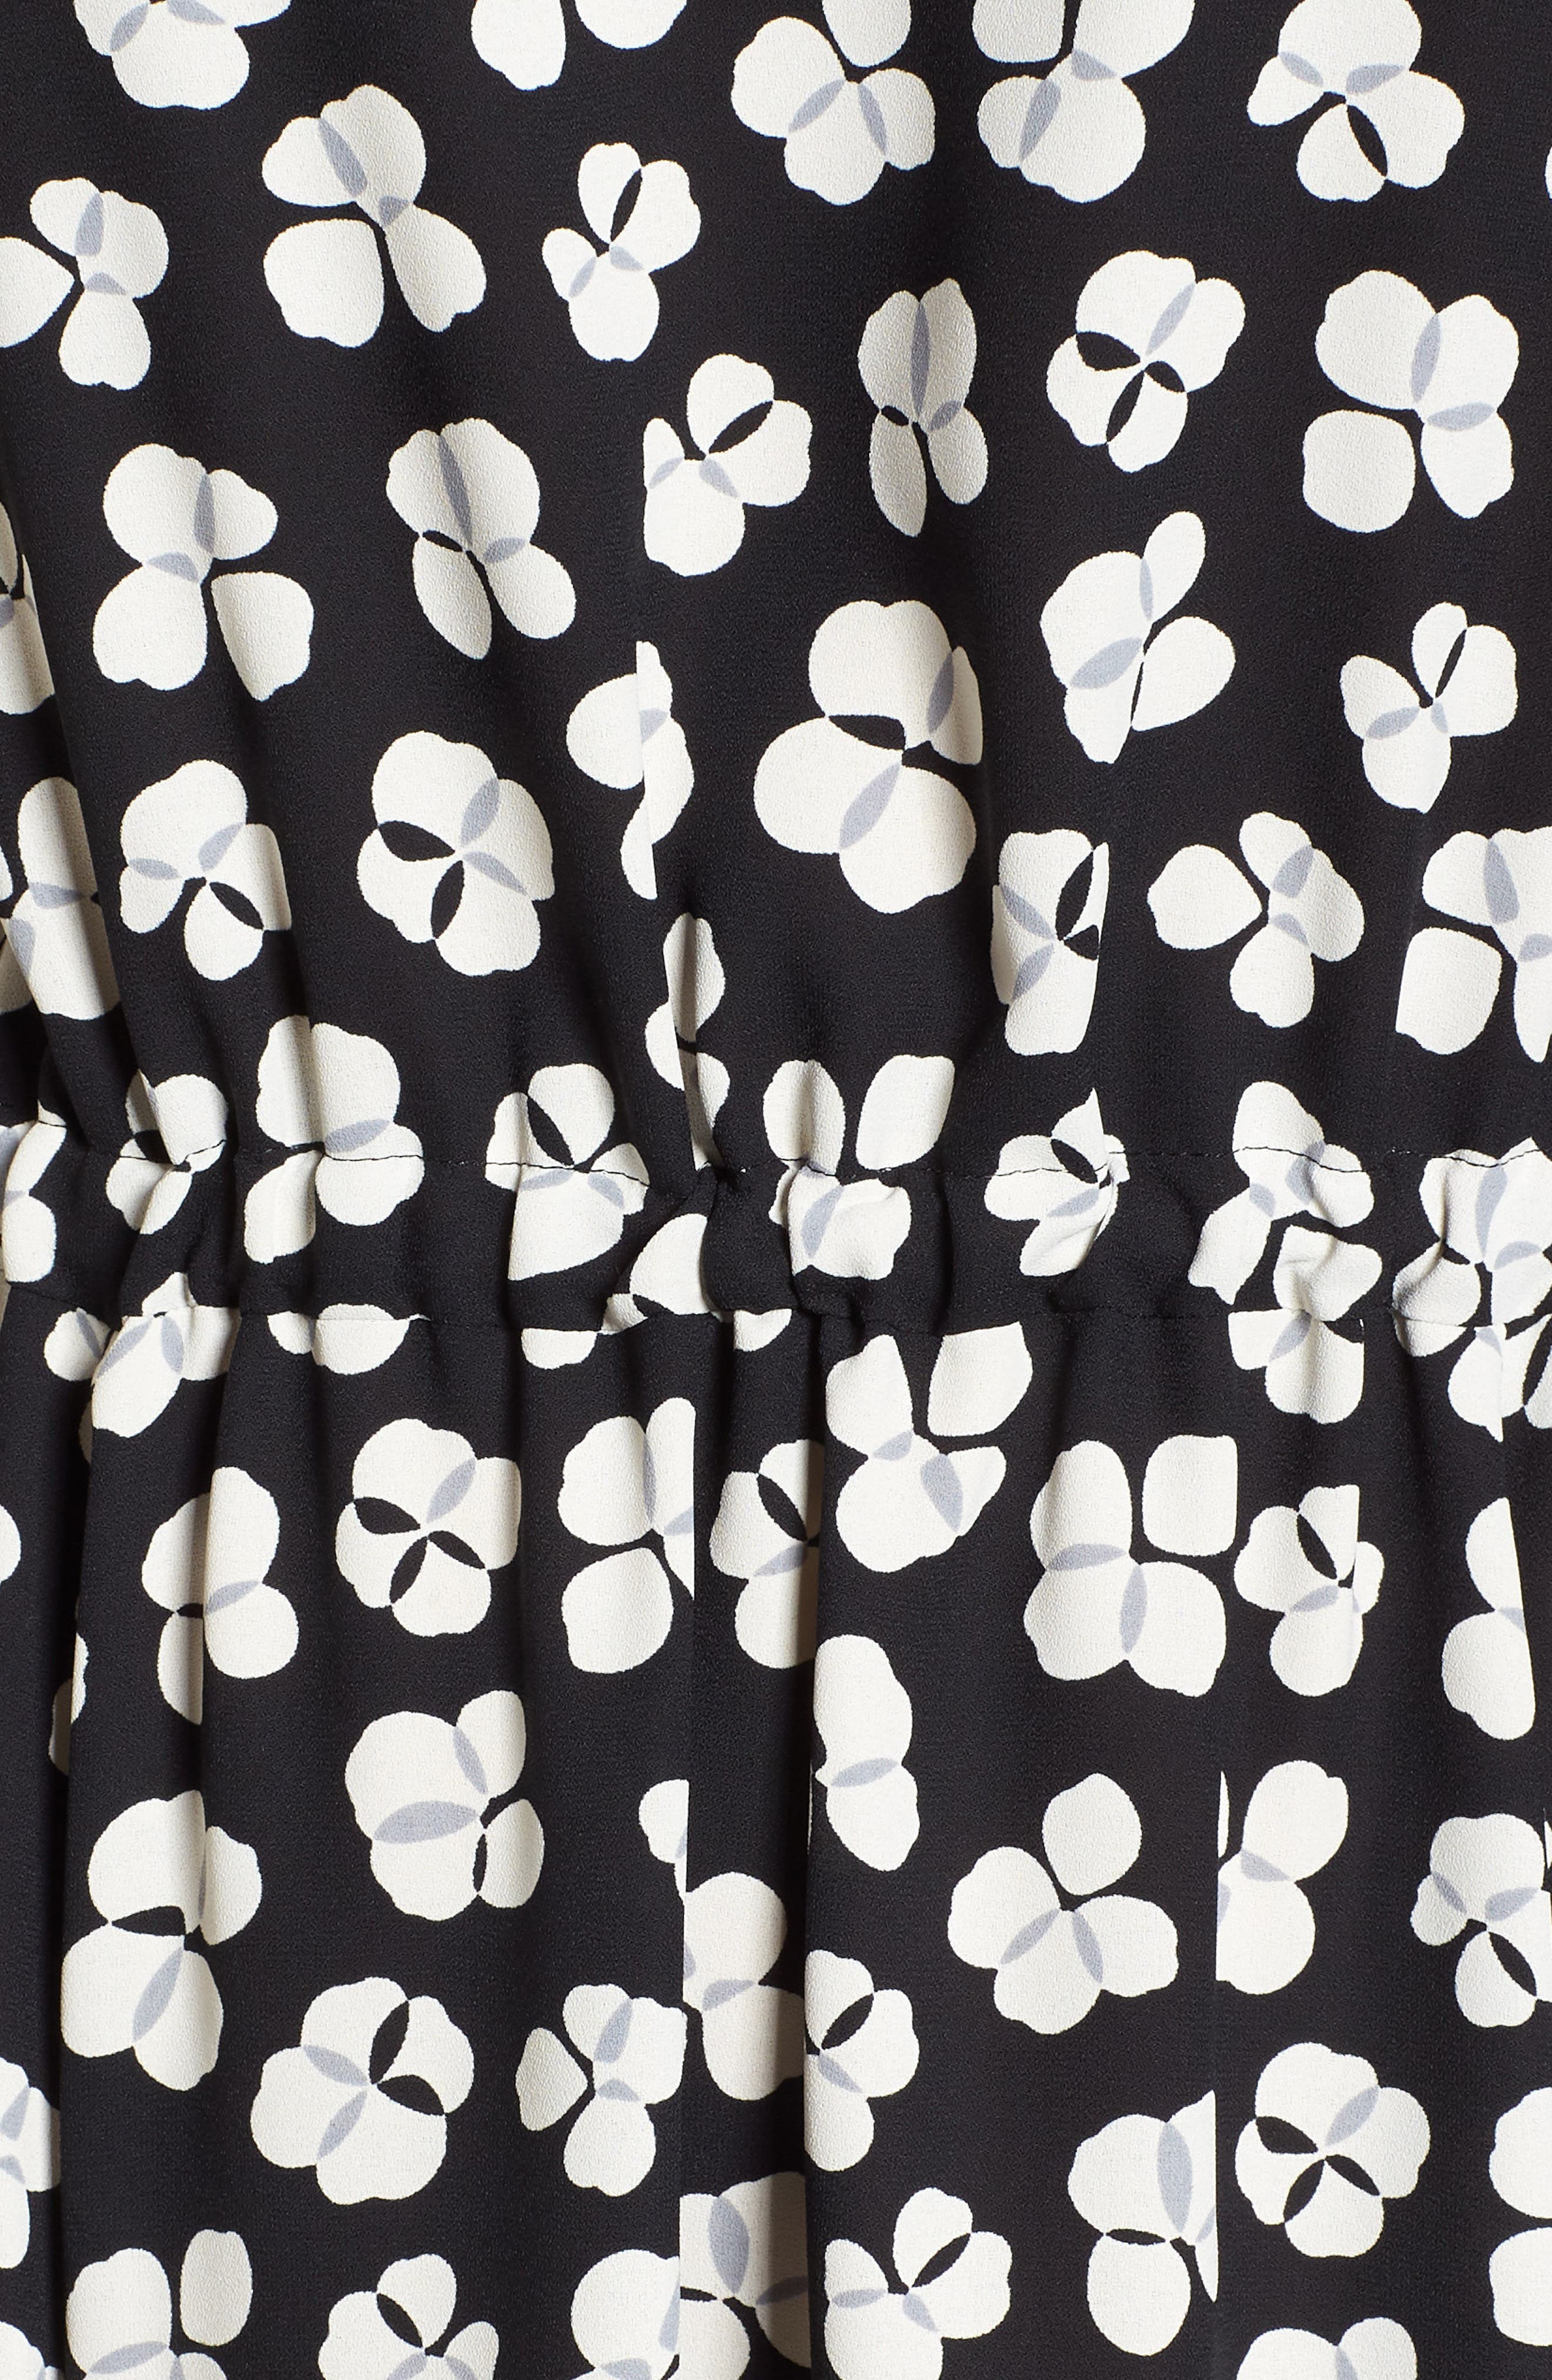 Zuma Petal Drawstring Midi Dress,                             Alternate thumbnail 6, color,                             001